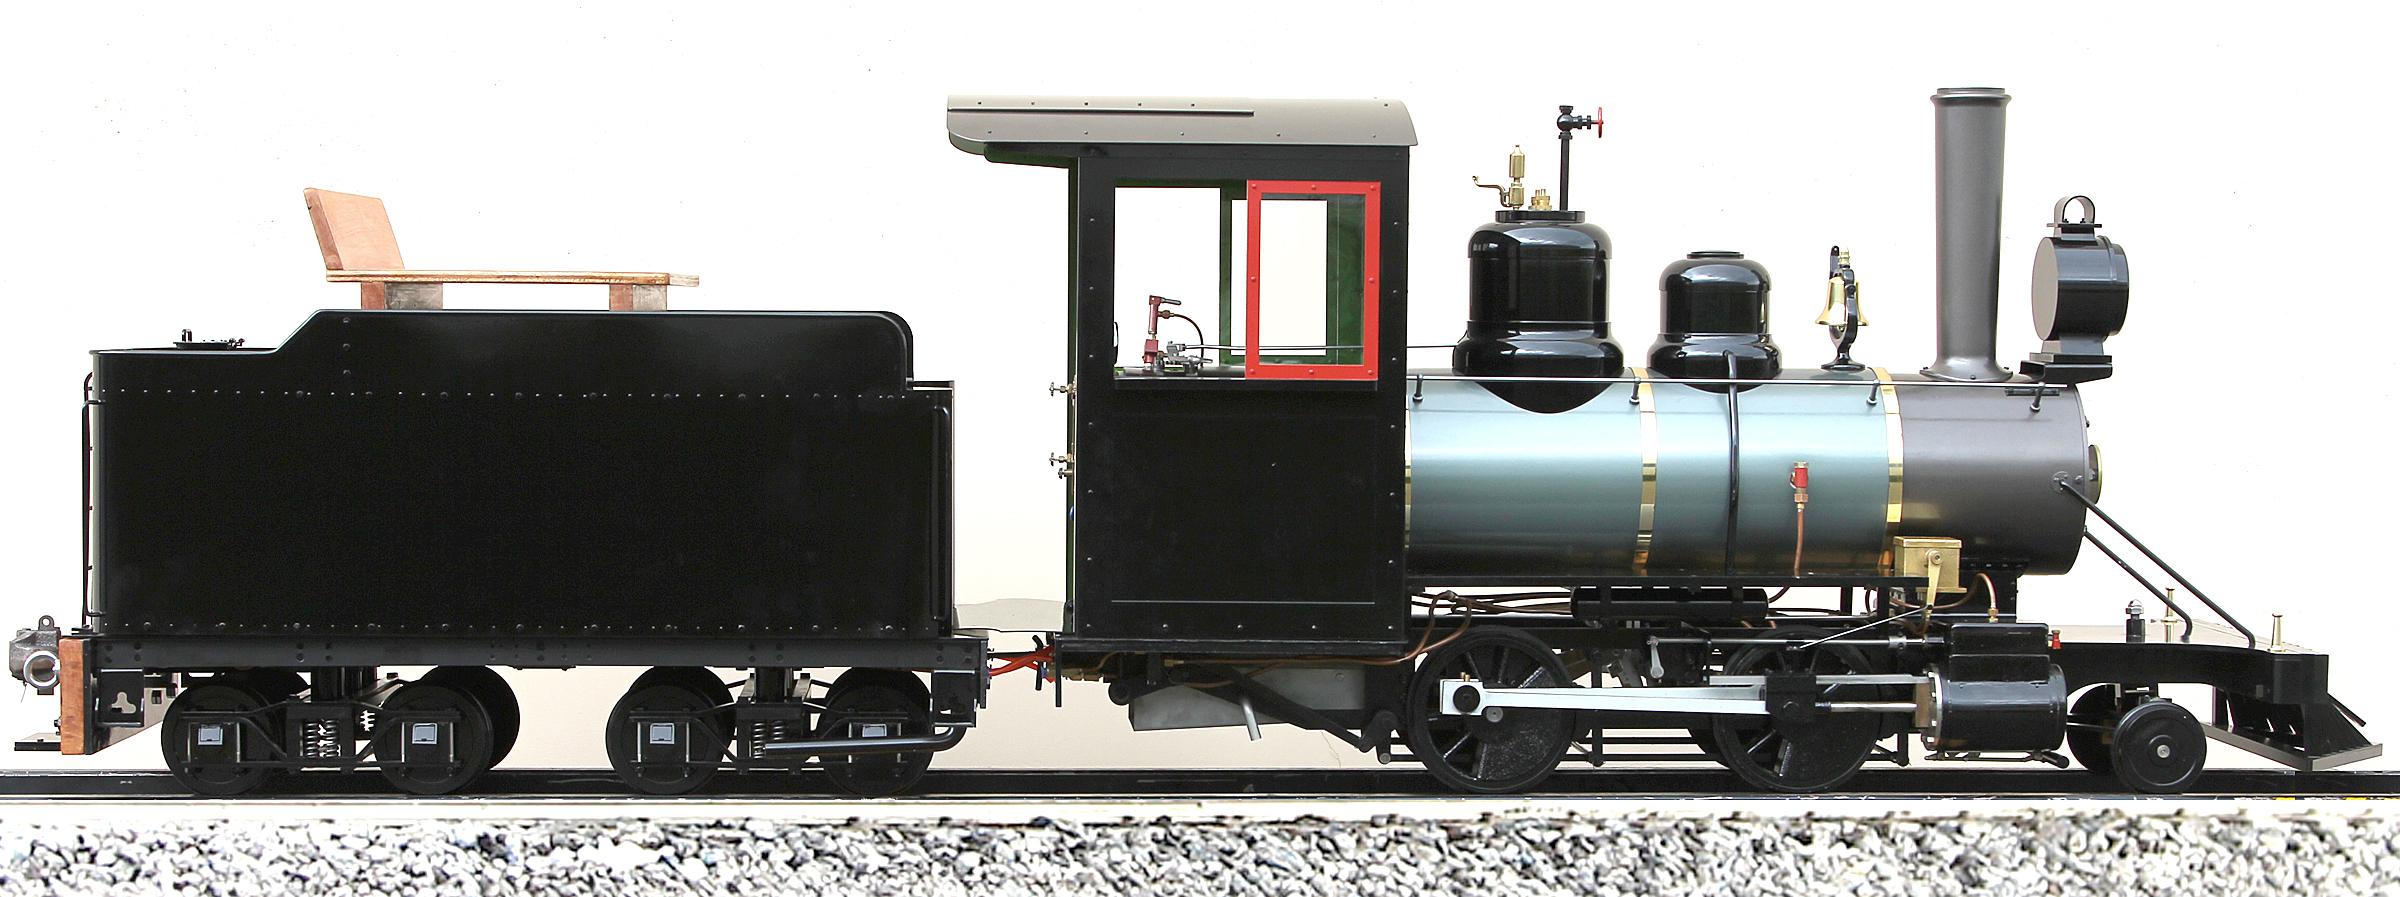 T795-01